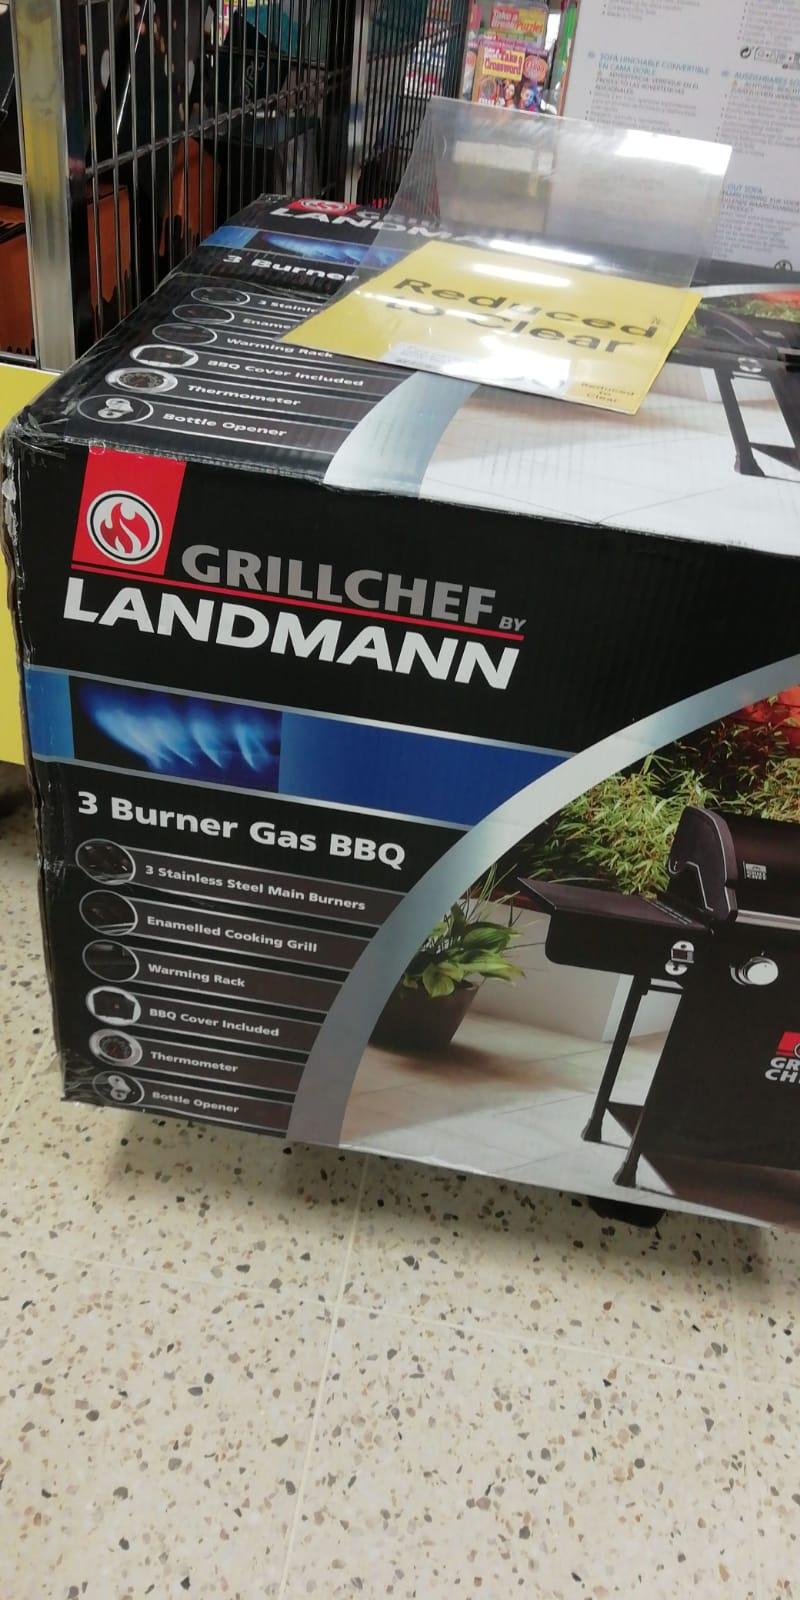 Landmann Grill Chef 3 Burner Gas BBQ instore at Tesco for £50 (Maryhill, Glasgow)